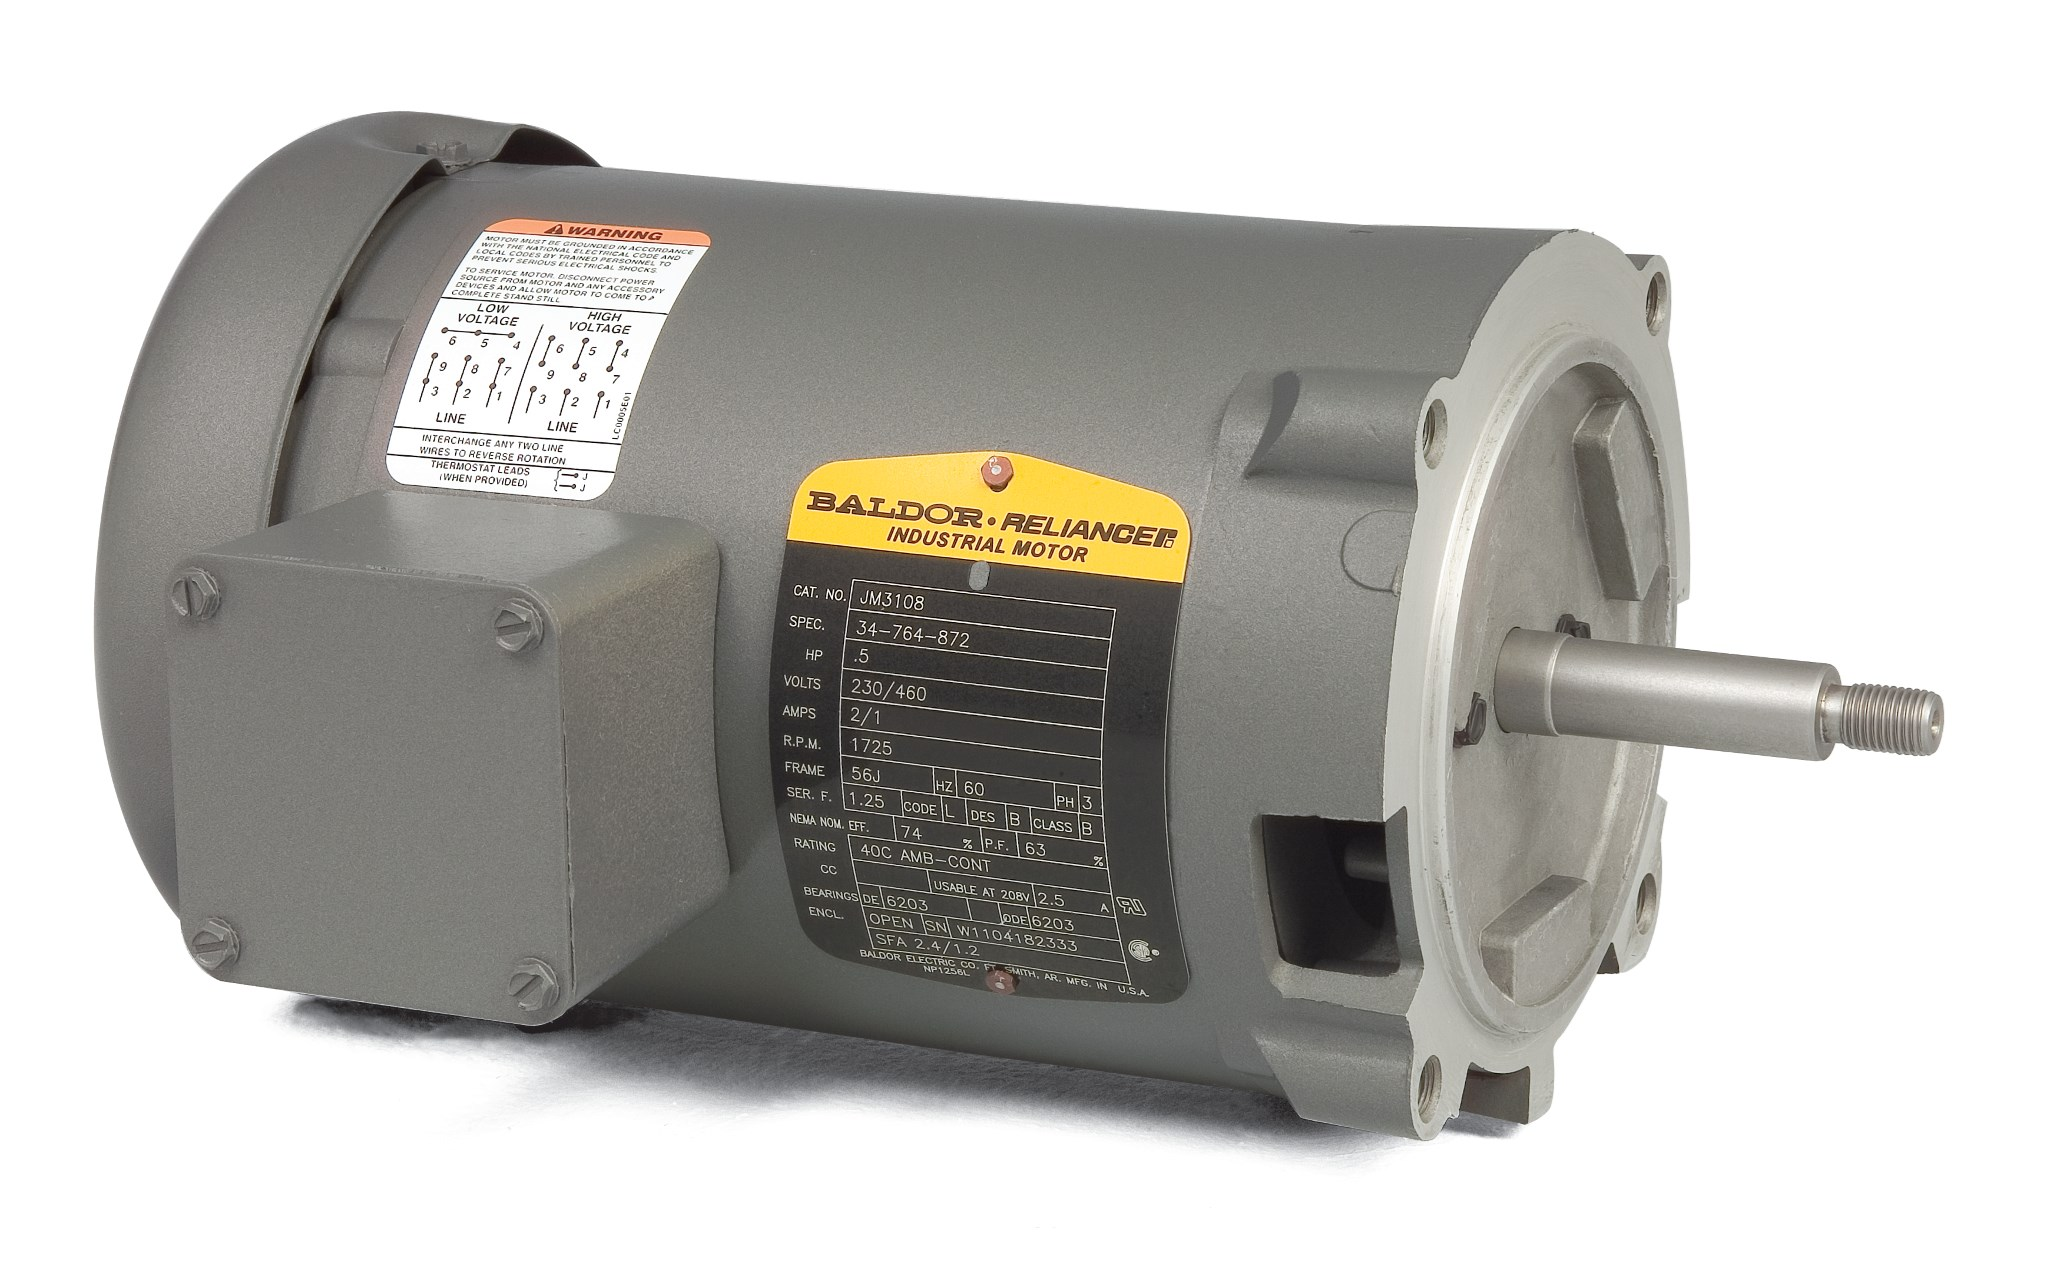 Baldor Pump Wiring Diagram Schemes Generator Diagrams Com Weil Pumps